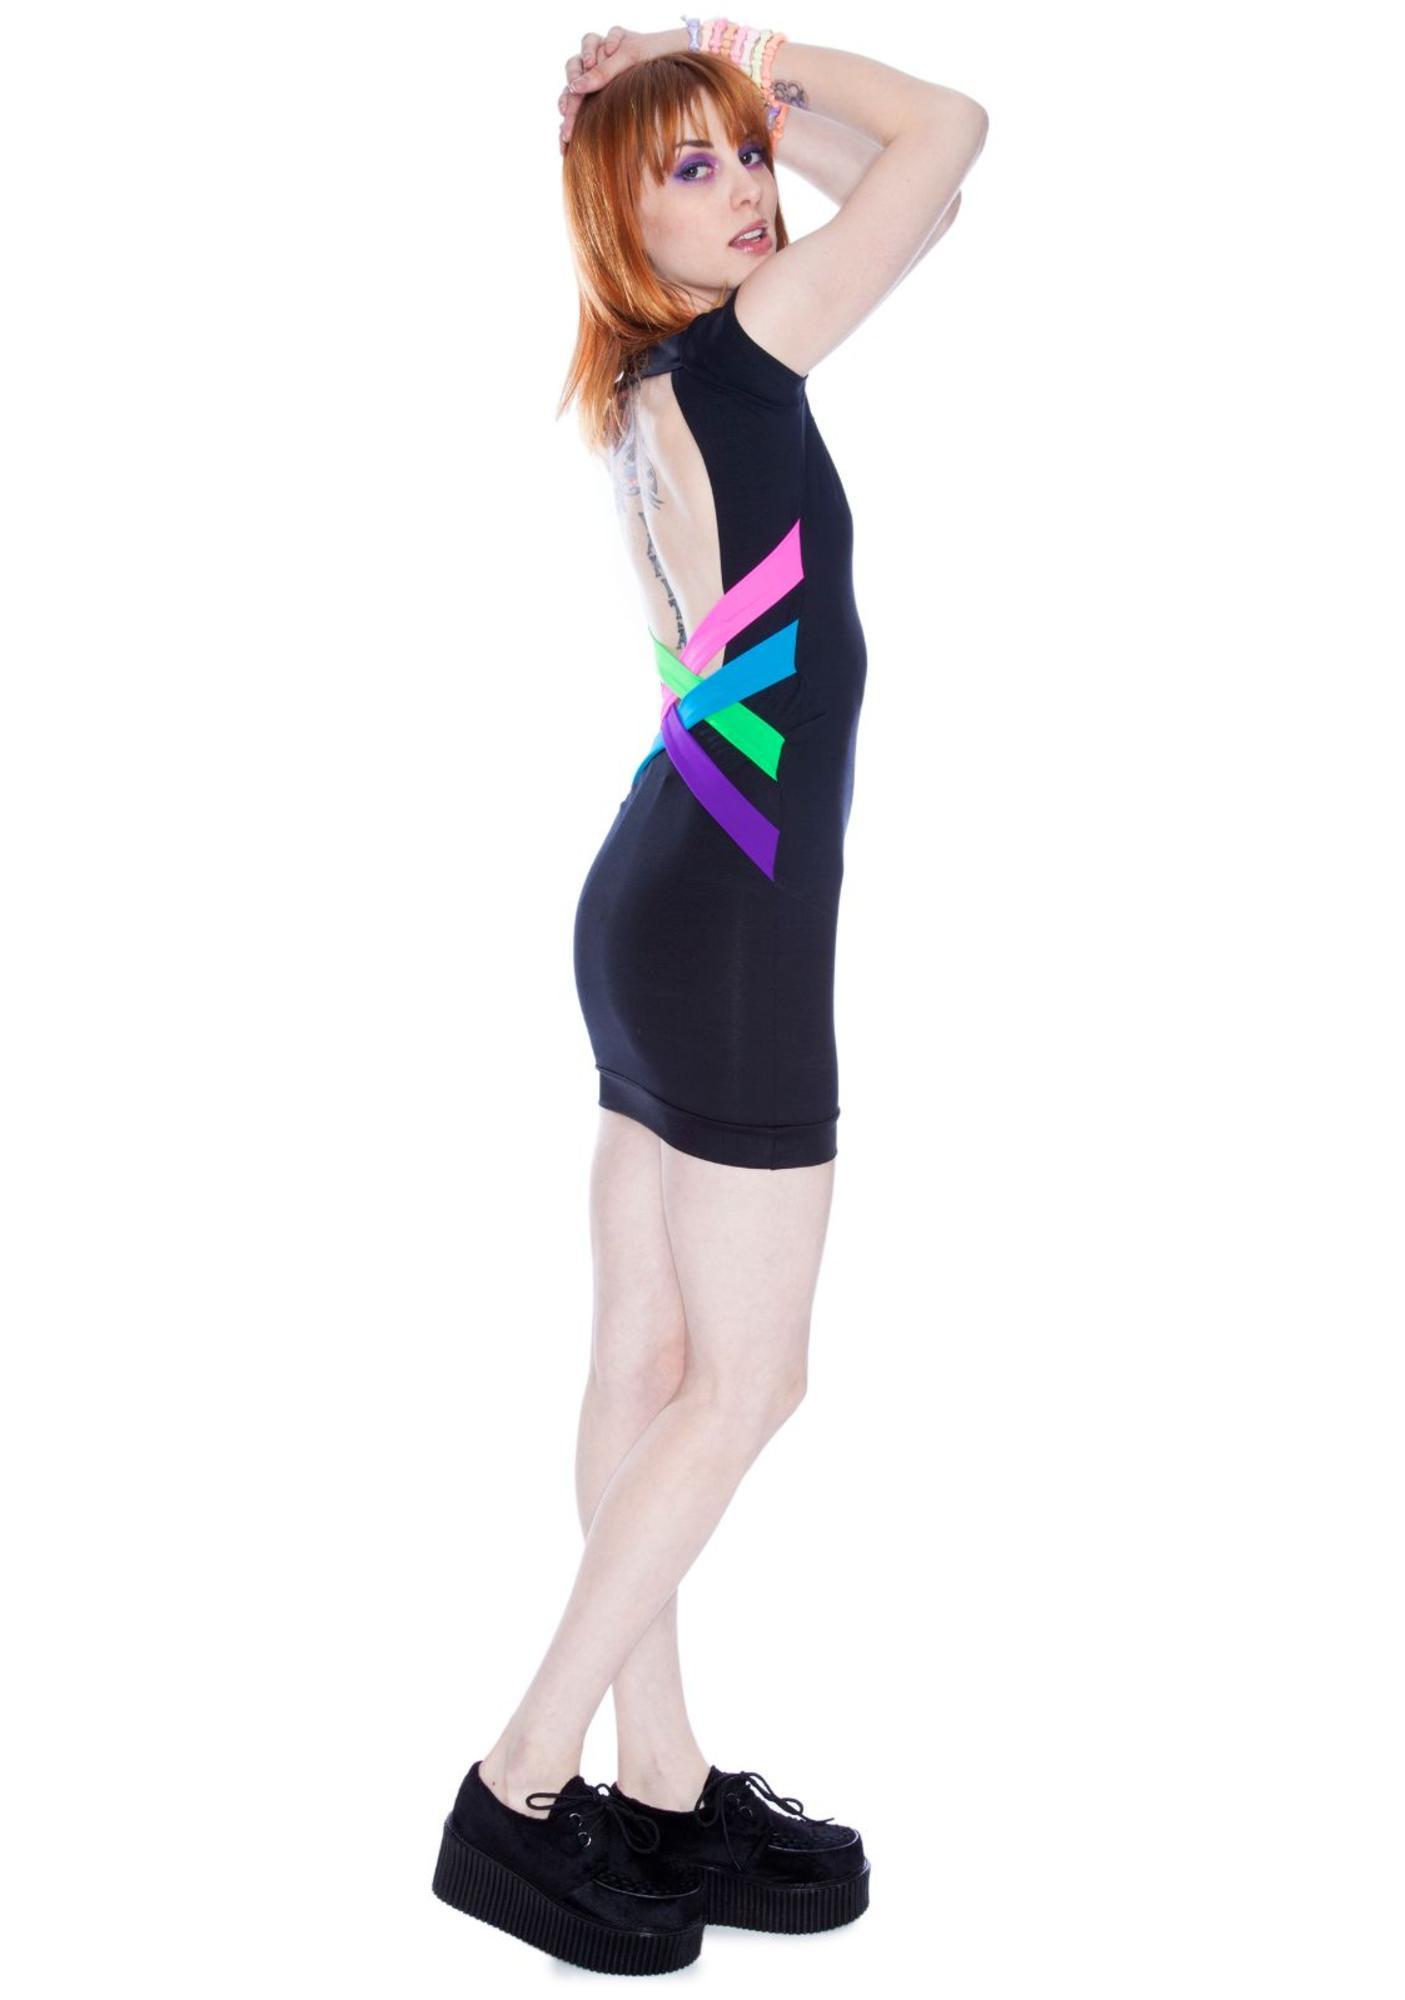 Criss Cross Black Neon Dress